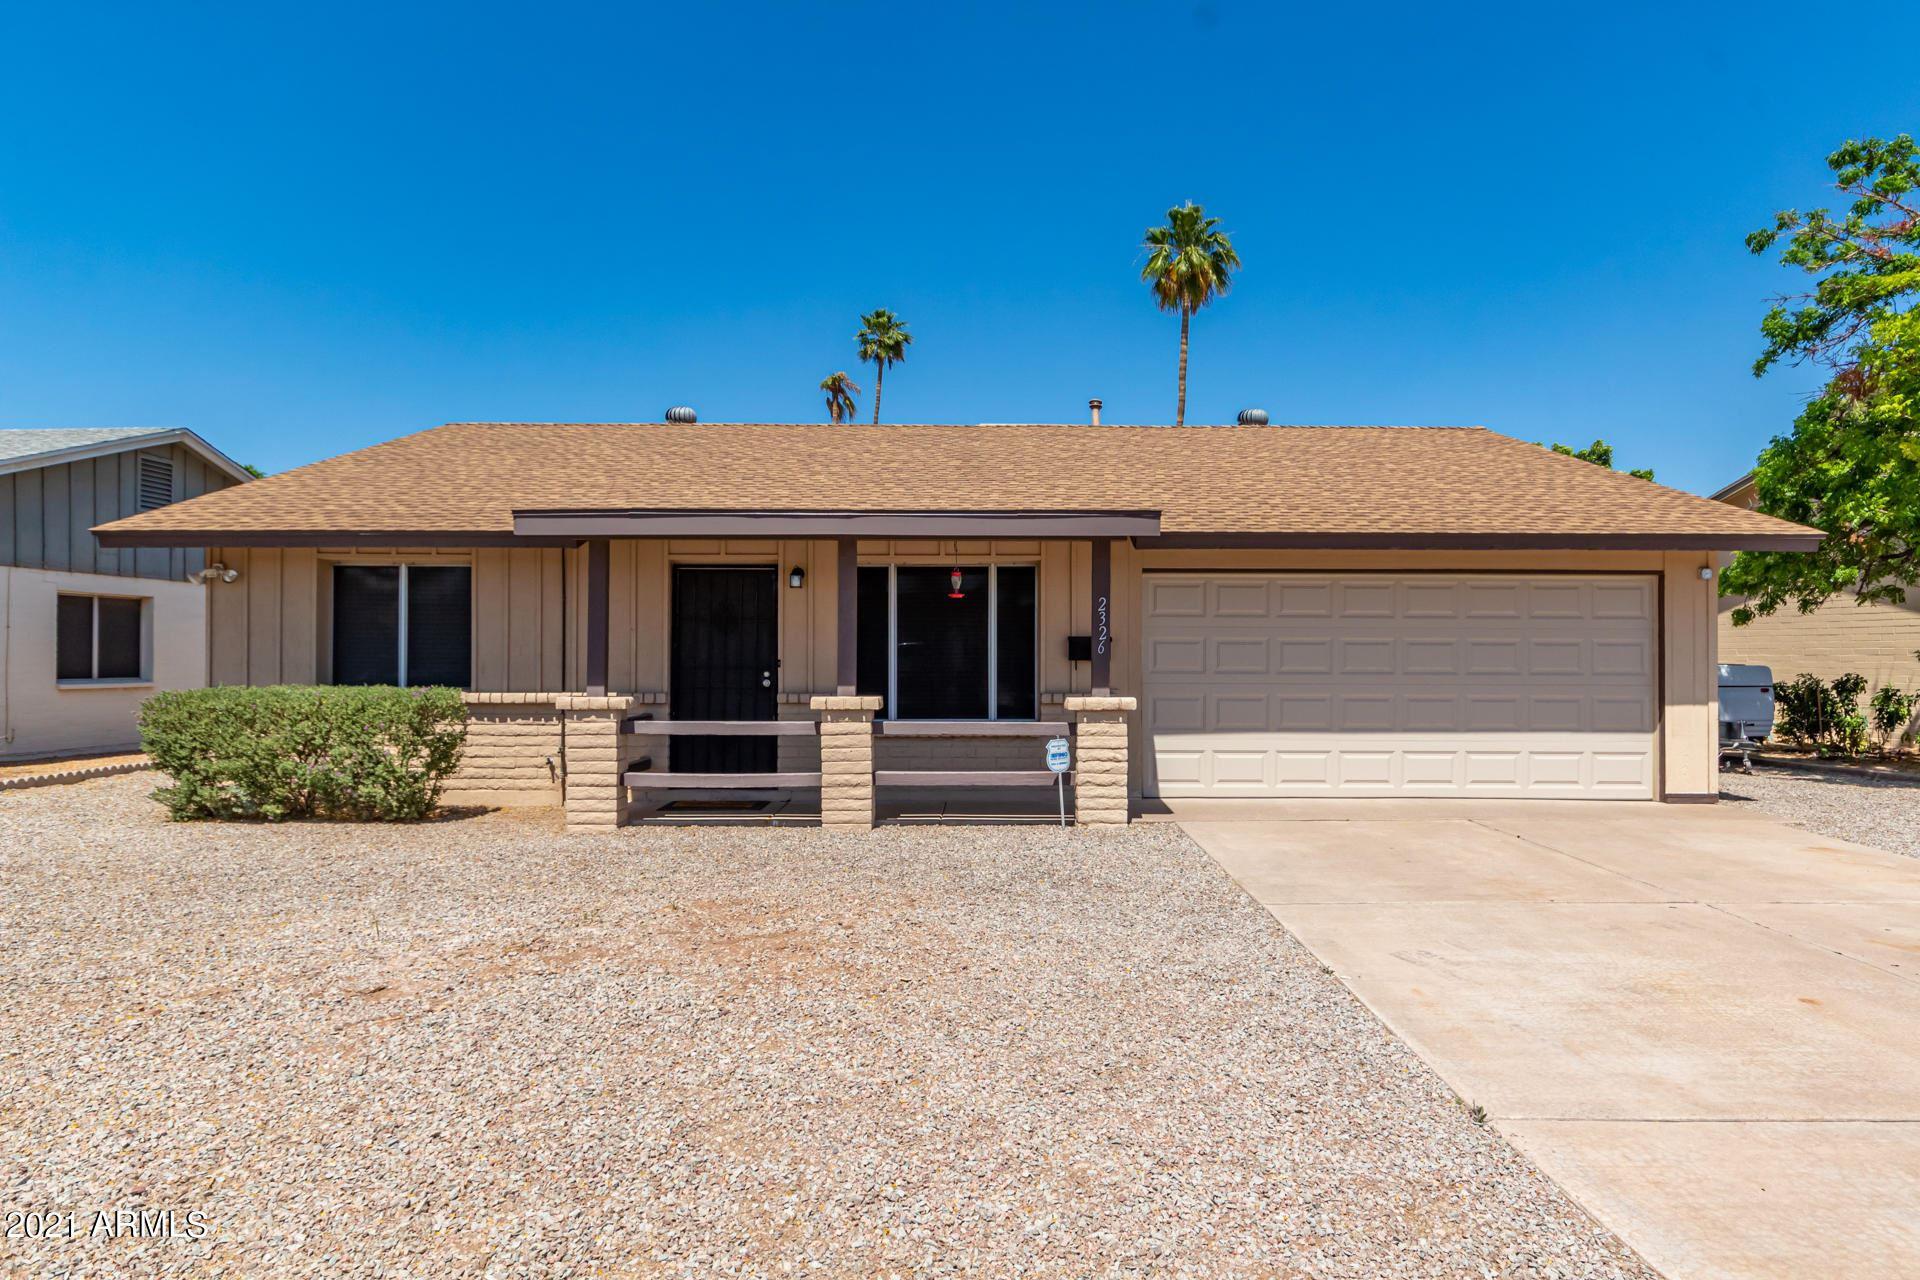 2326 E RIVIERA Drive, Tempe, AZ 85282 - MLS#: 6231115